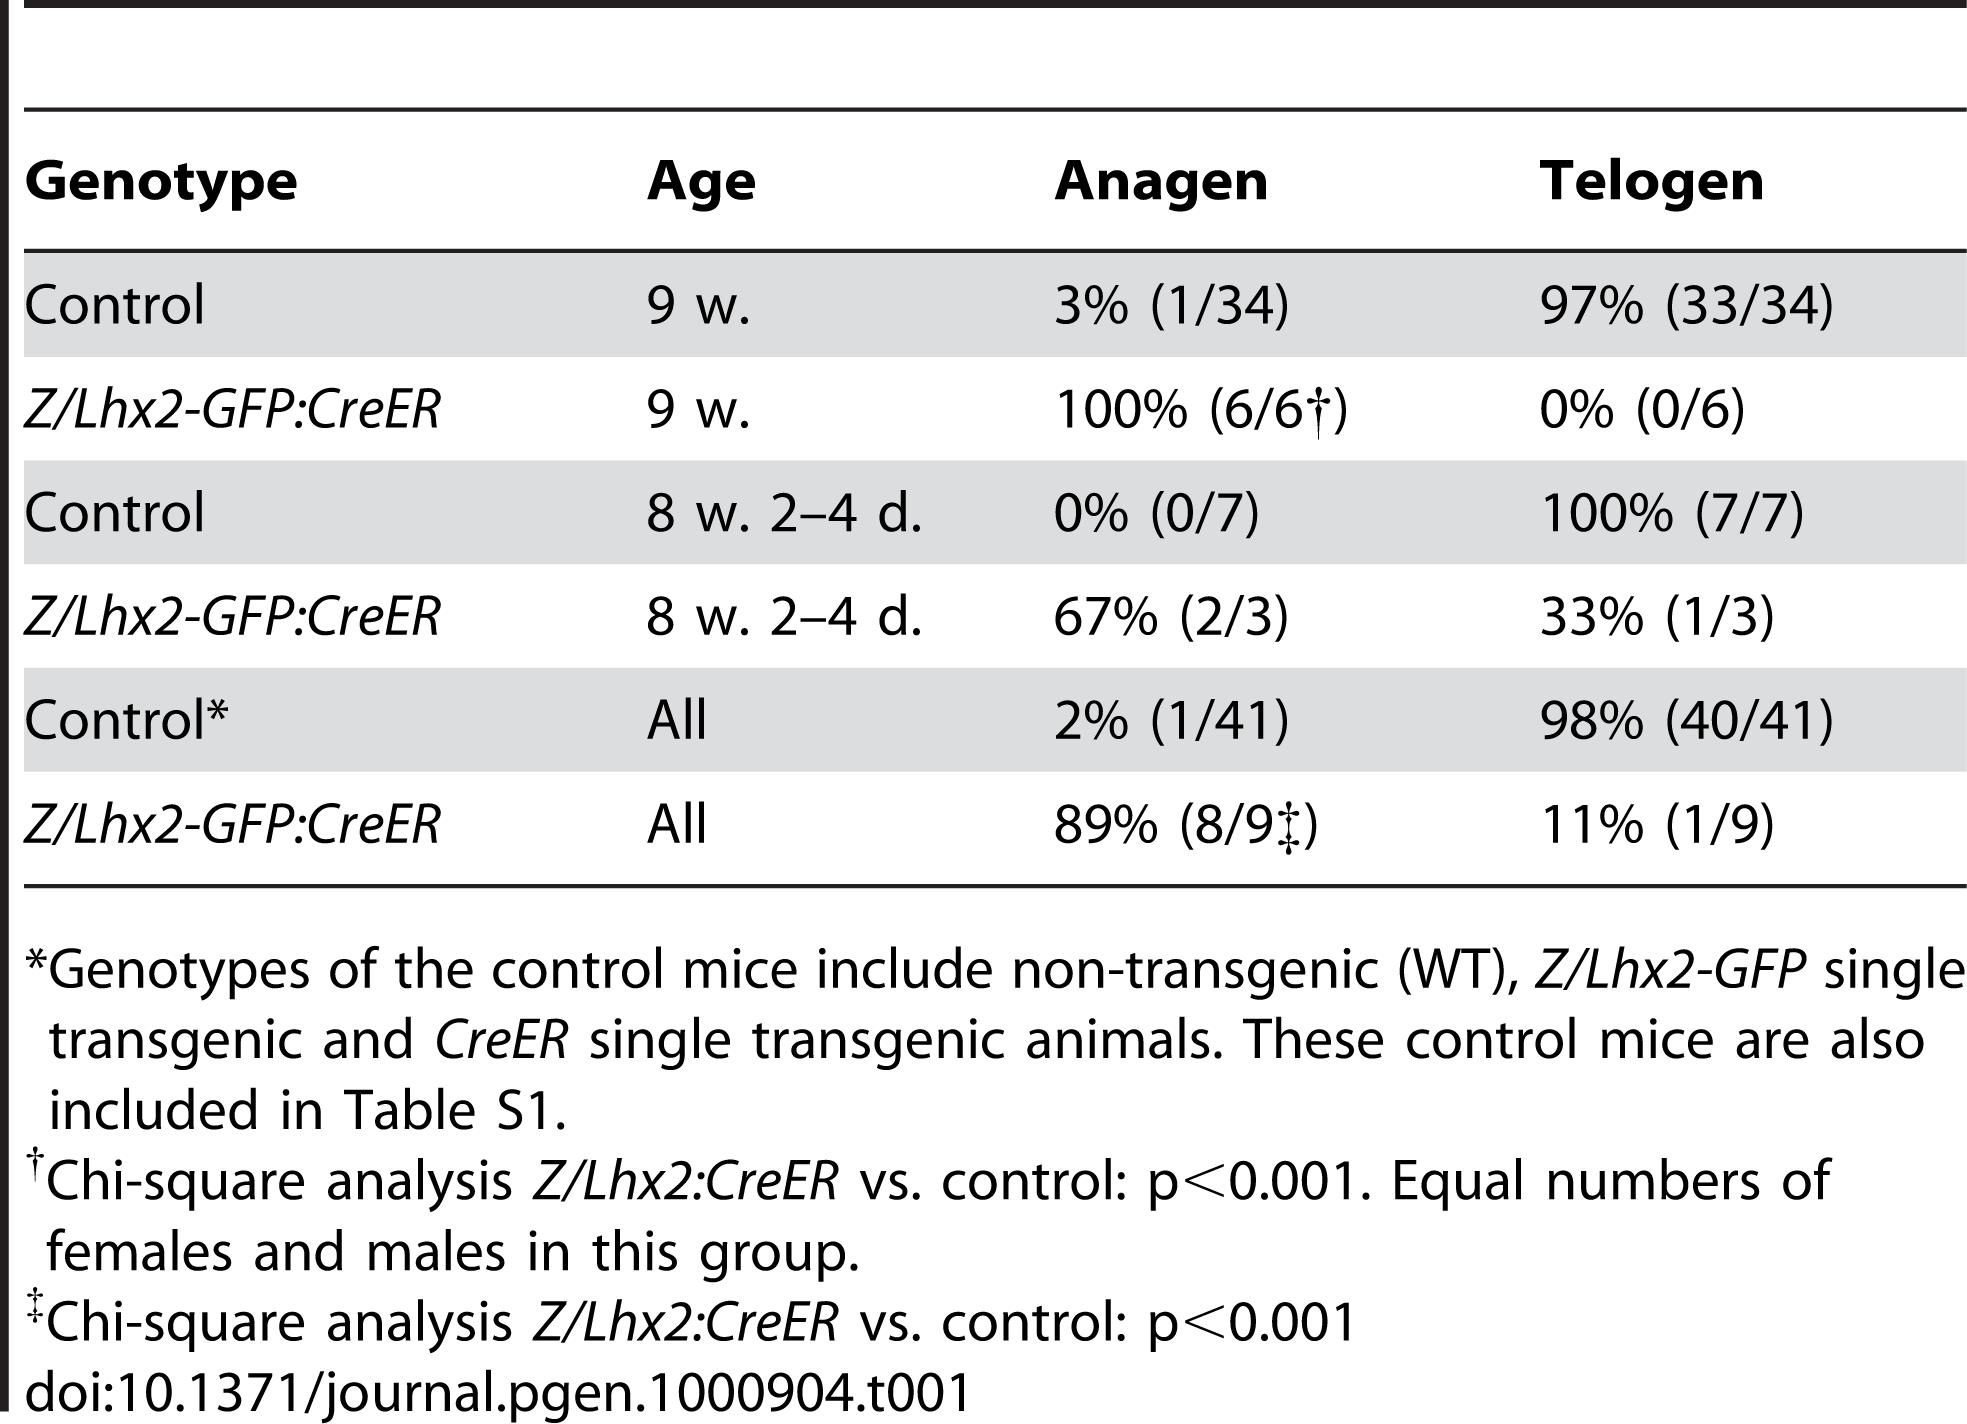 Lhx2 expression induce anagen.